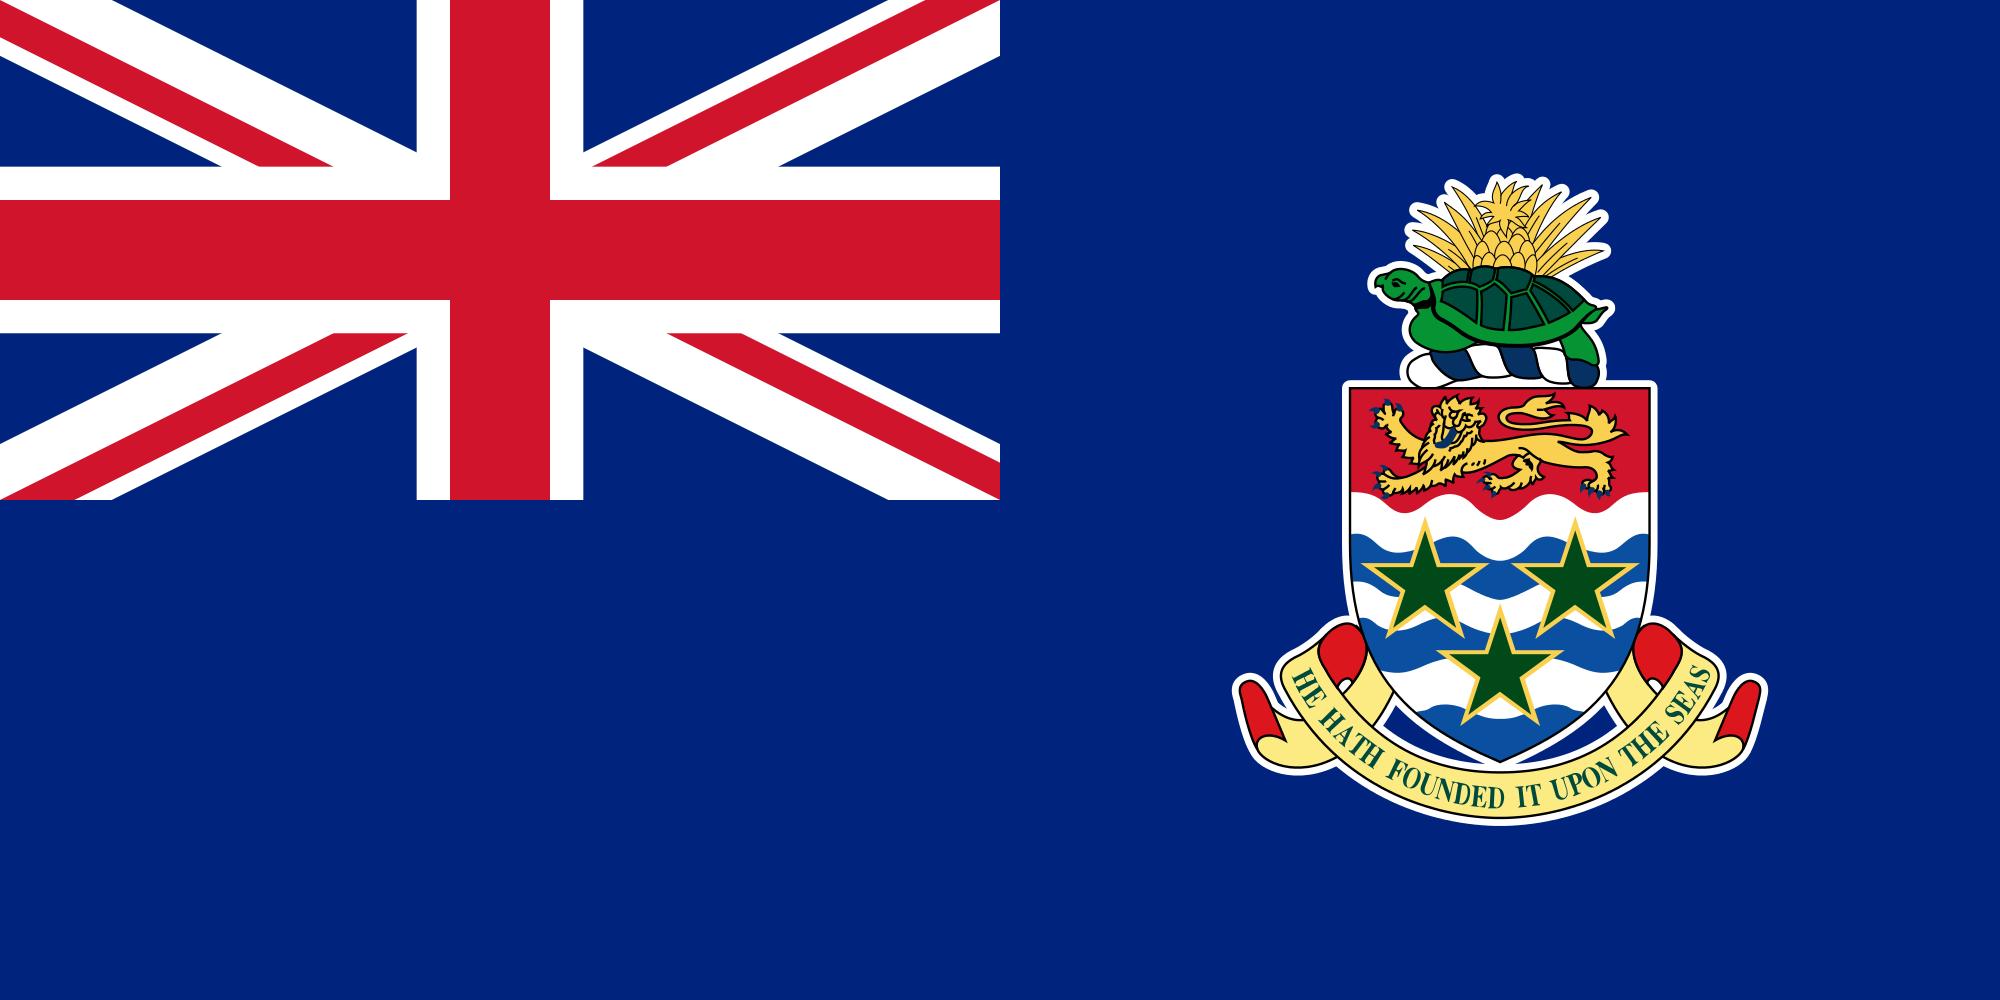 islas caimán, país, emblema, insignia, σύμβολο - Wallpapers HD - Professor-falken.com